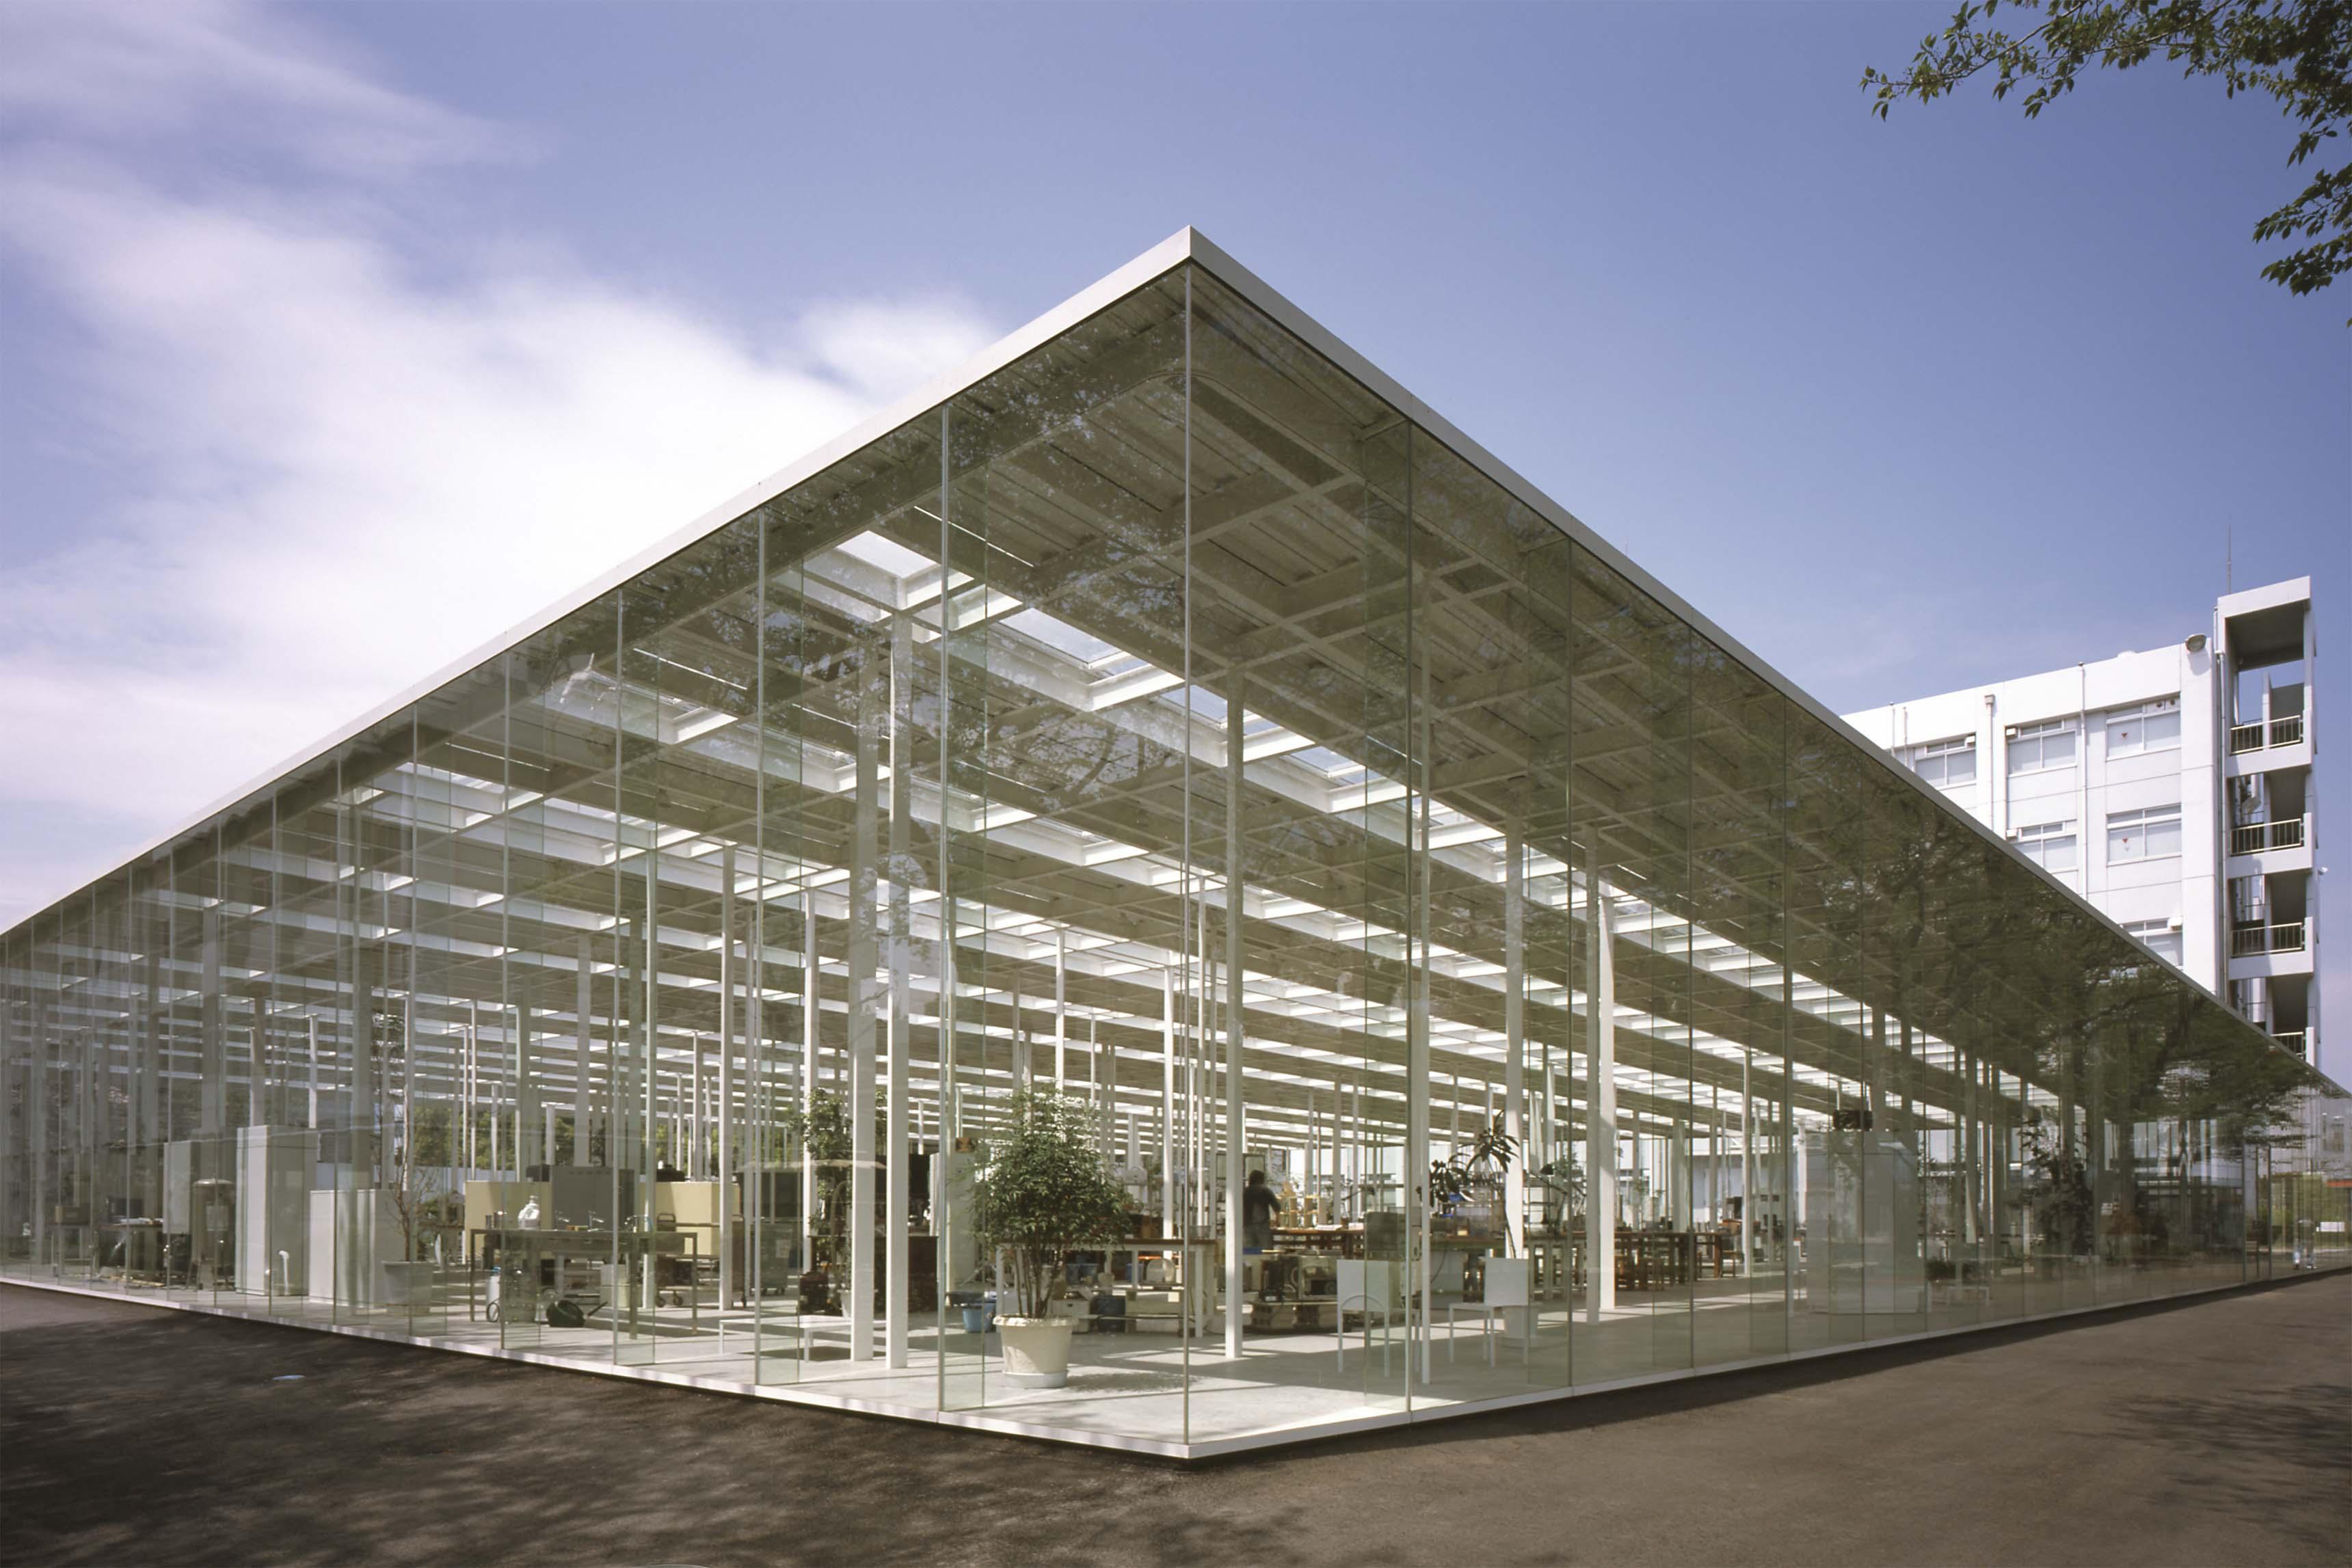 Junya Ishigami, Atelier KAIT, Institut de technologie de Kanagawa, 2008